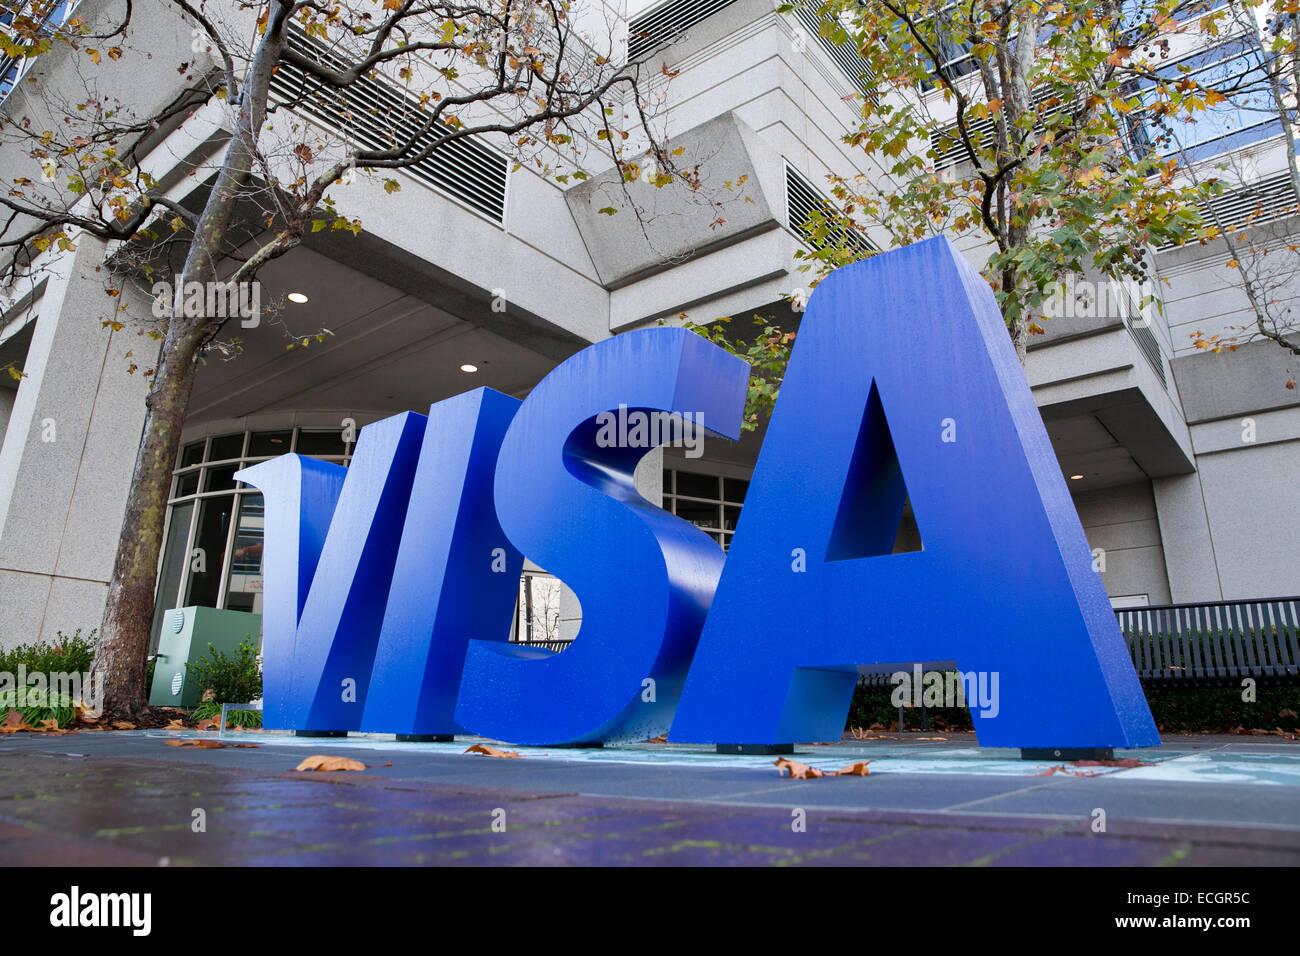 Das Hauptquartier der Kreditkartenanbieter Visa. Stockbild